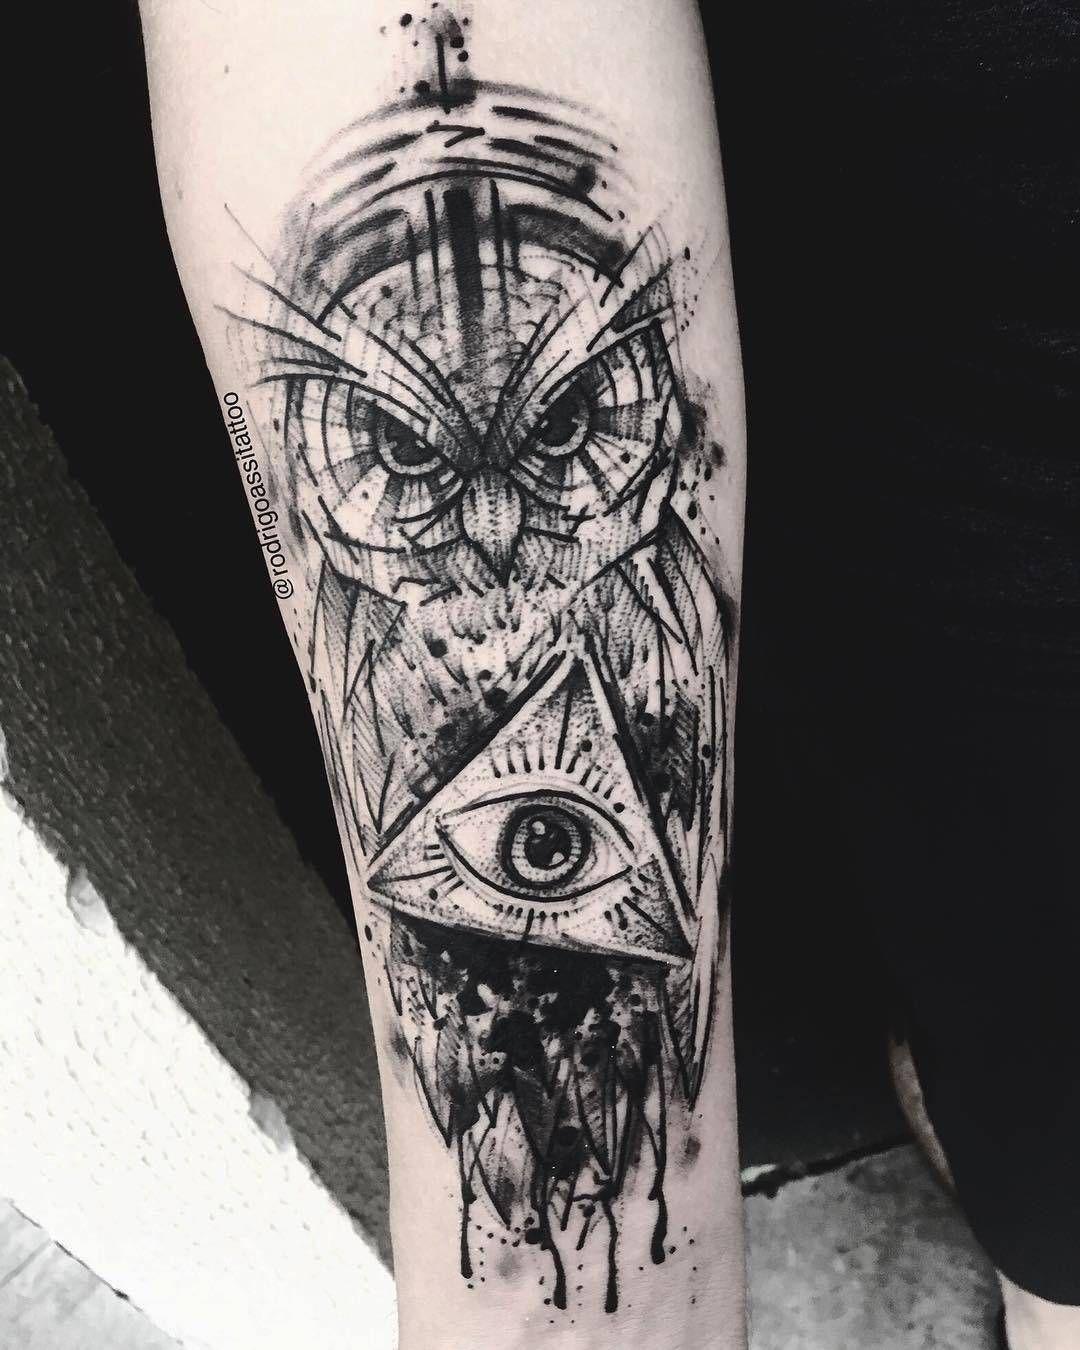 Rodrigo Assi Sketch Tattoos In 2020 Sketch Style Tattoos Tattoo Sketches Tattoos